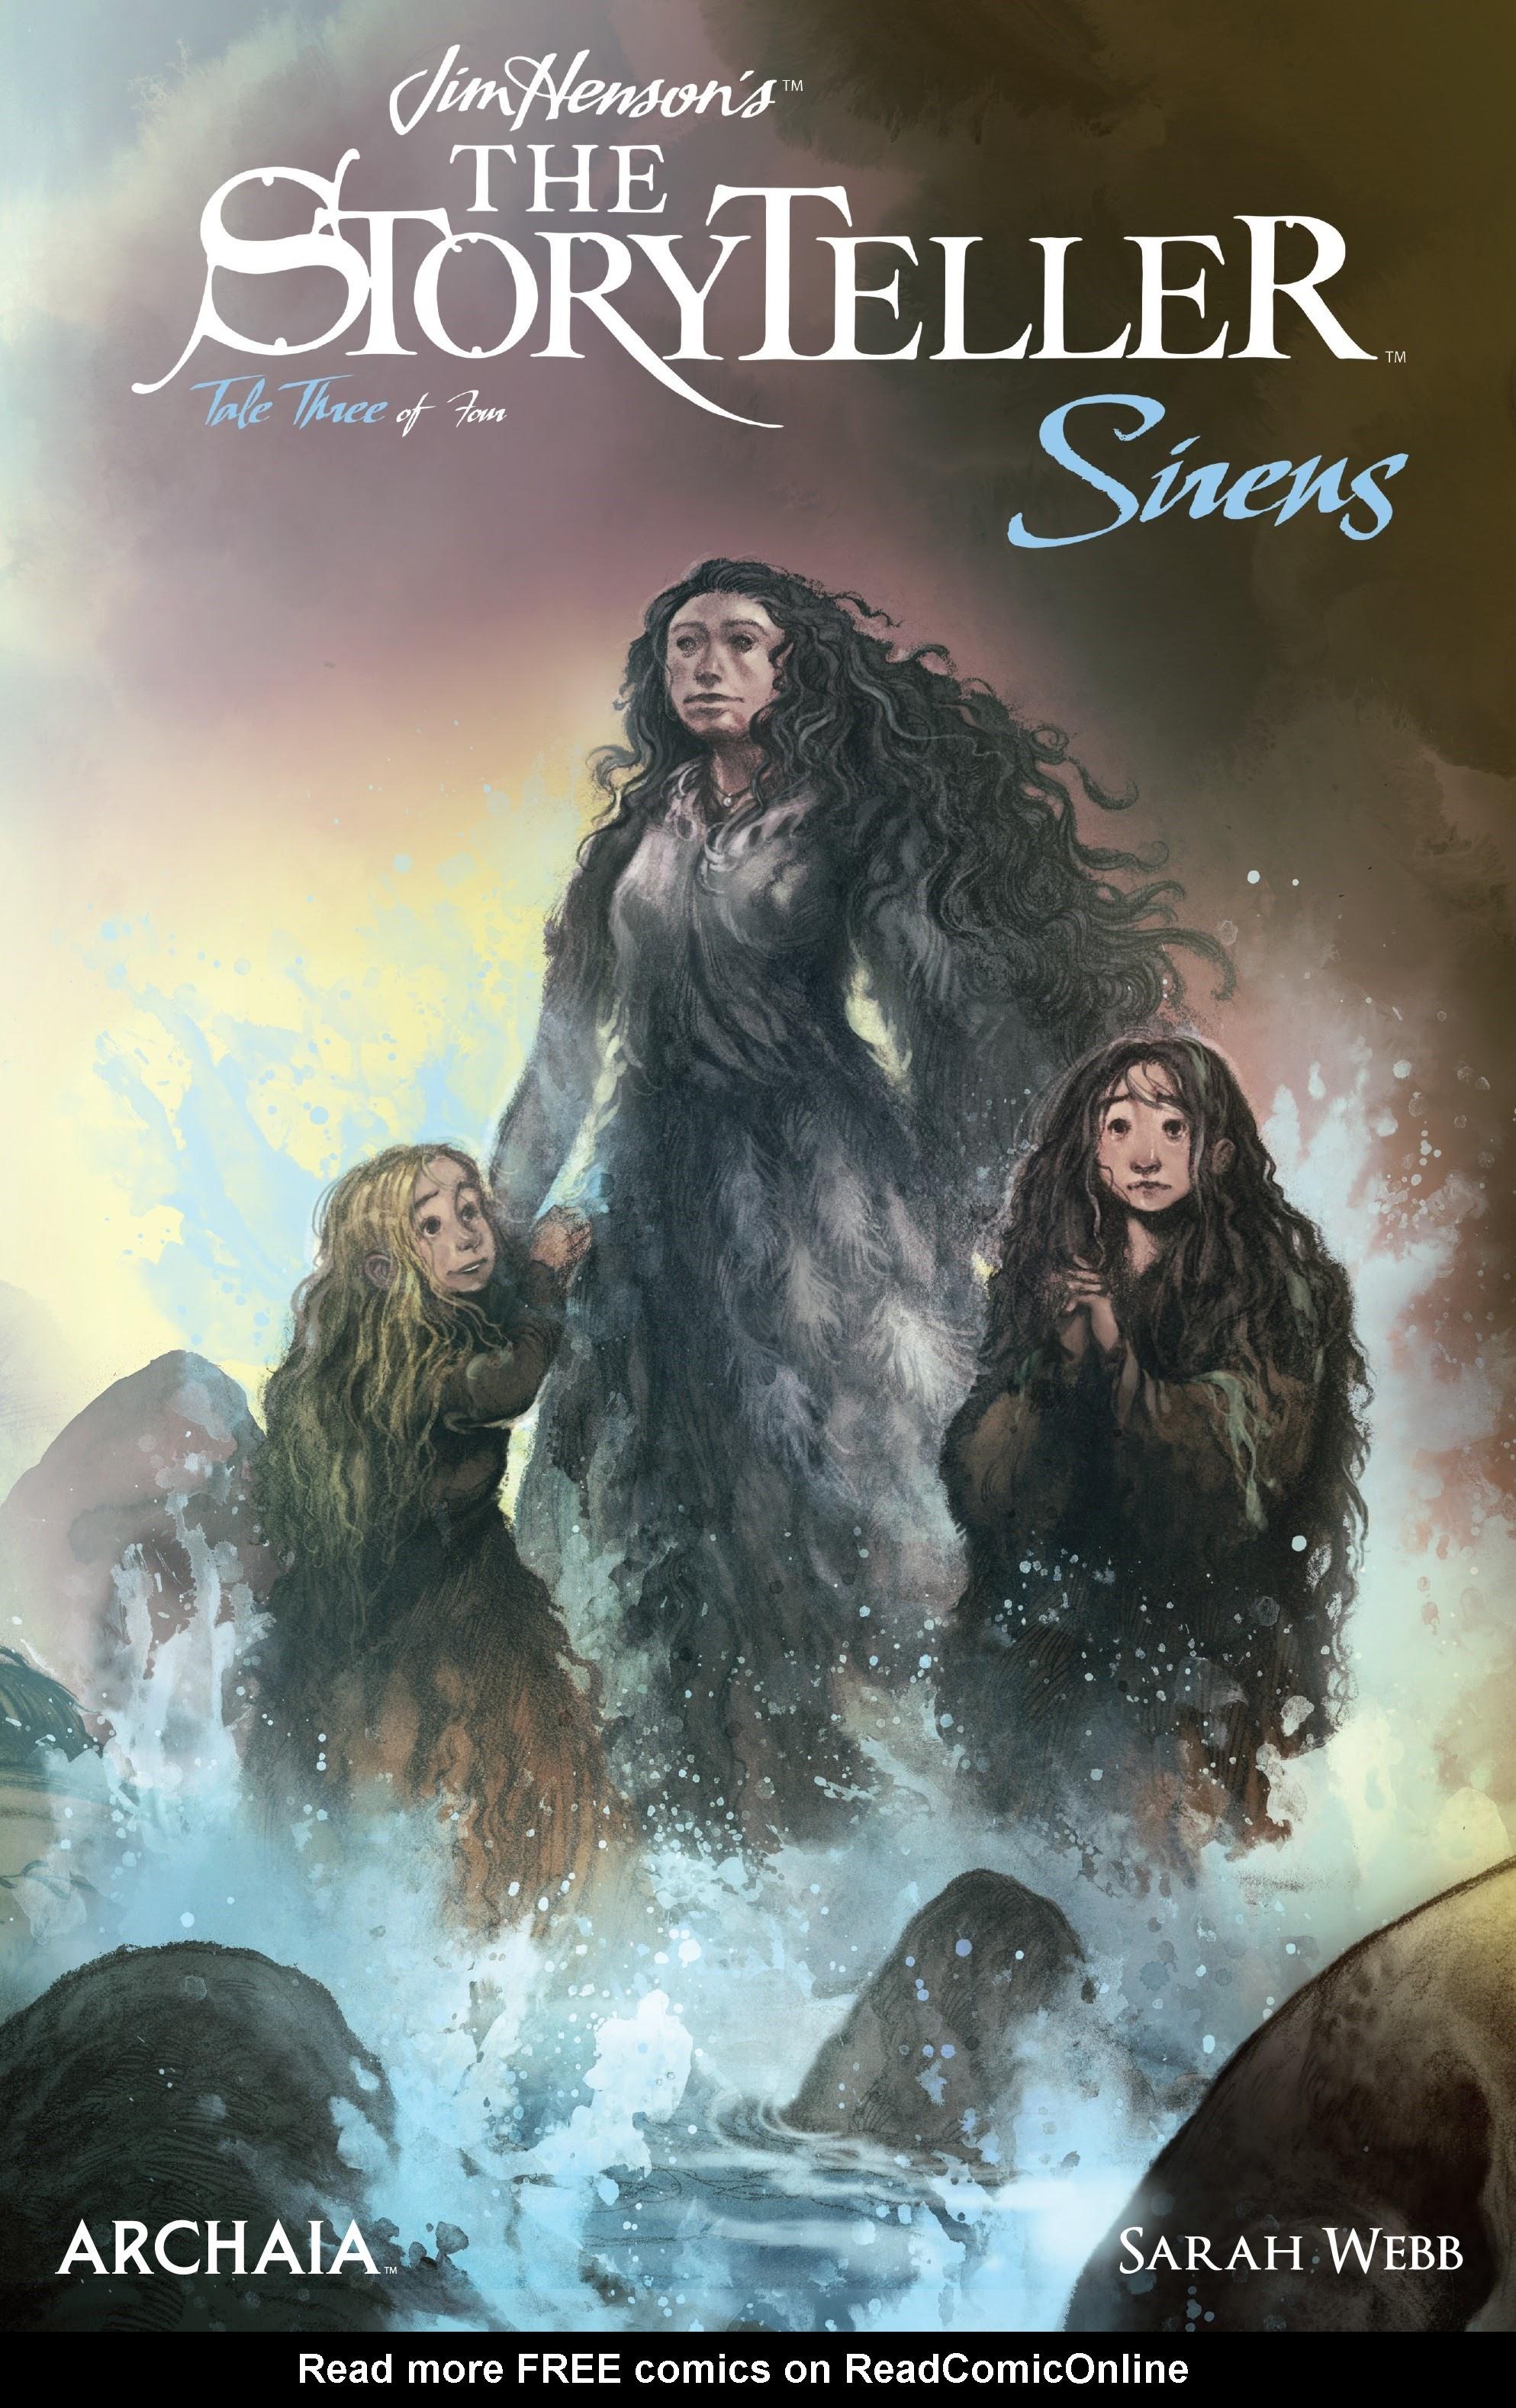 Jim Hensons The Storyteller: Sirens 3 Page 1